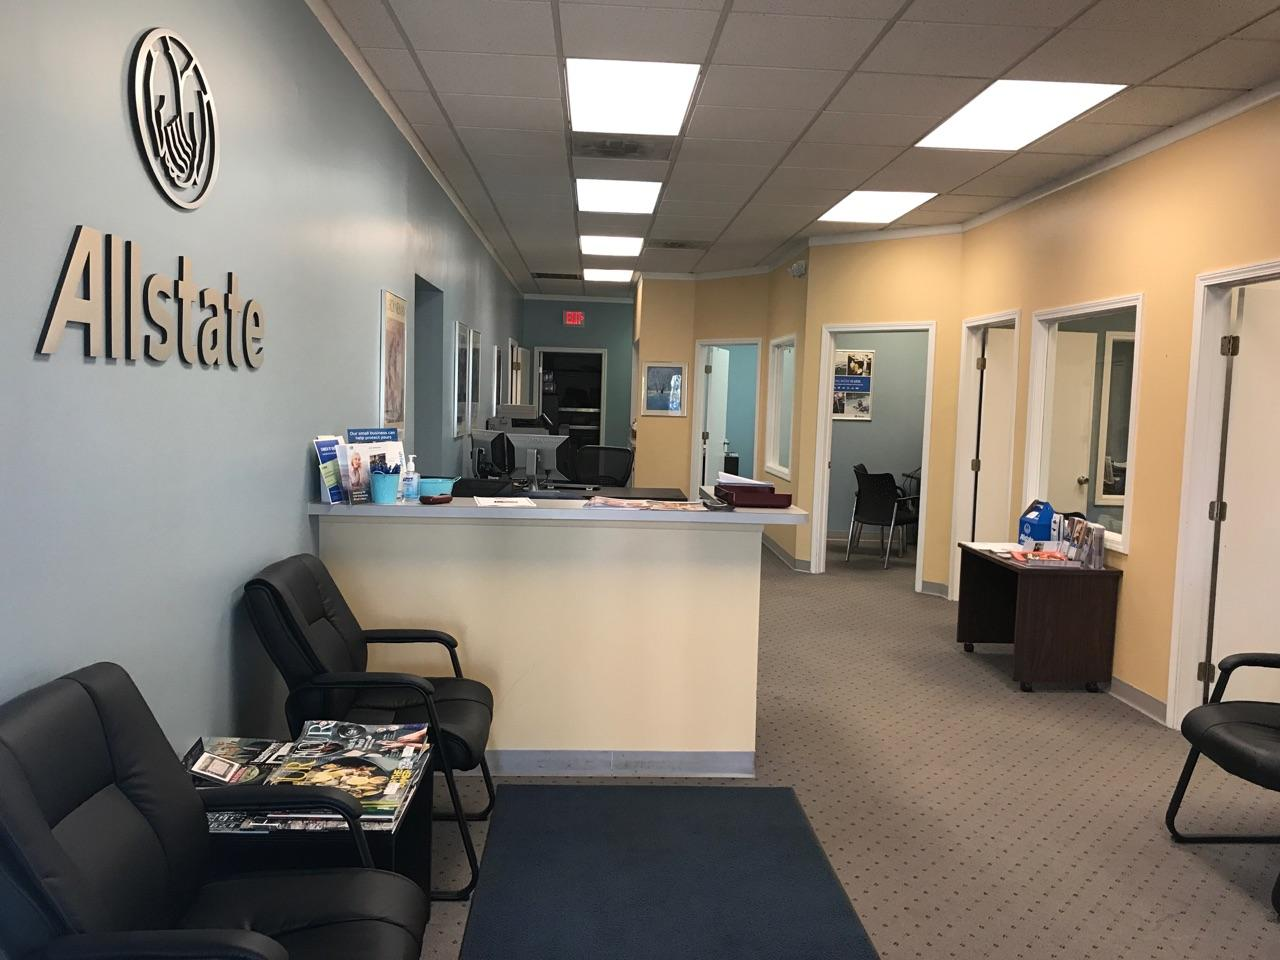 Joel Schembri: Allstate Insurance image 2